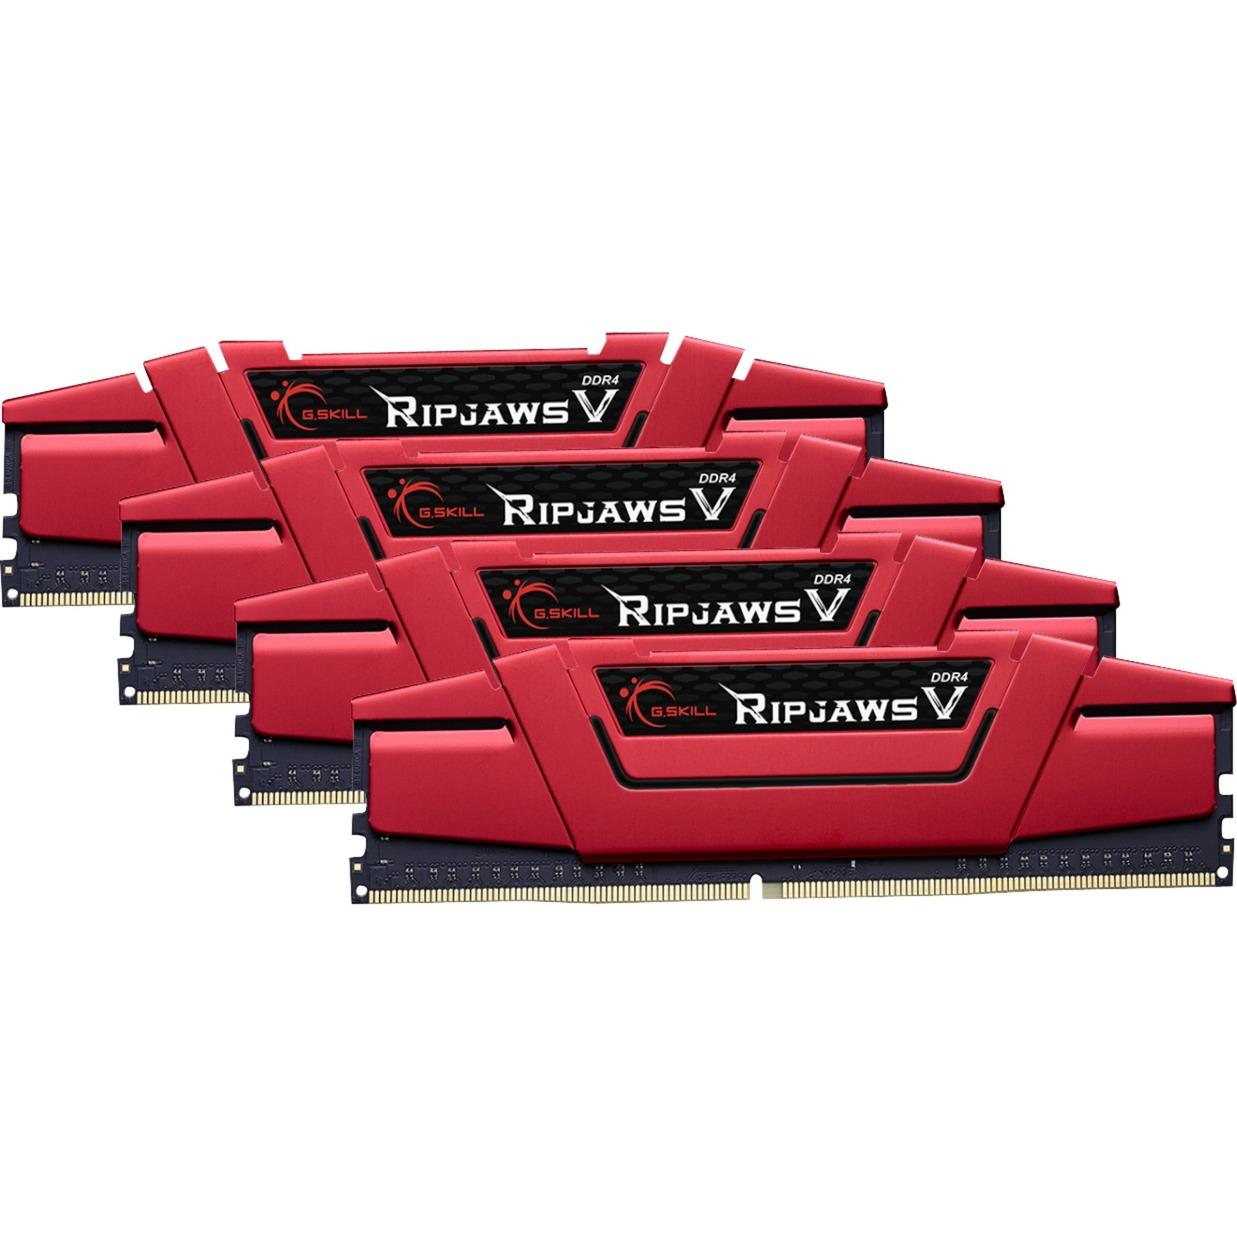 D432Go 3200-15 Ripjaws V Red K4 GSK, Mémoire